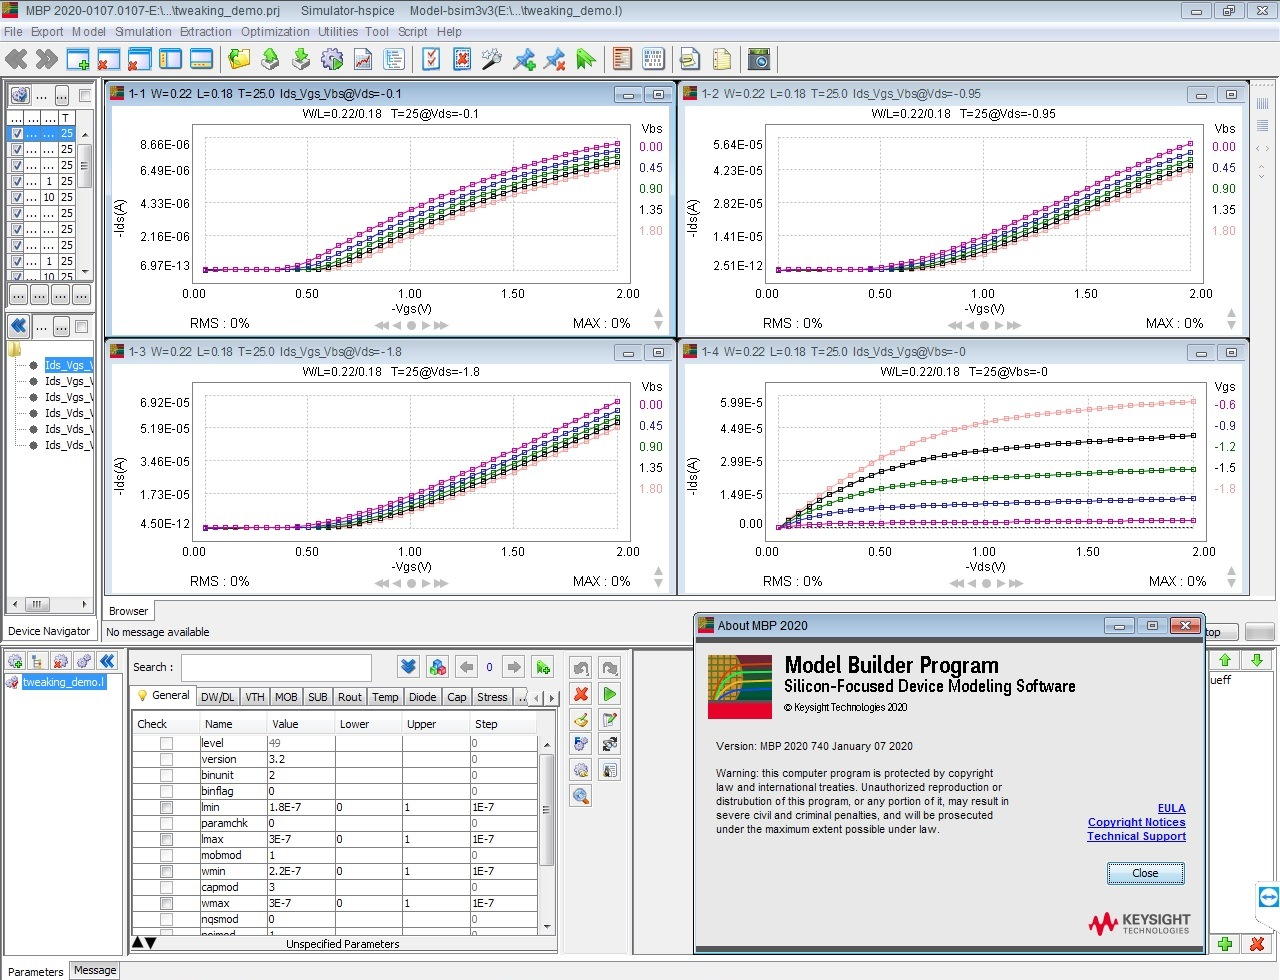 Working with Keysight Model Builder Program (MBP) 2020 full license